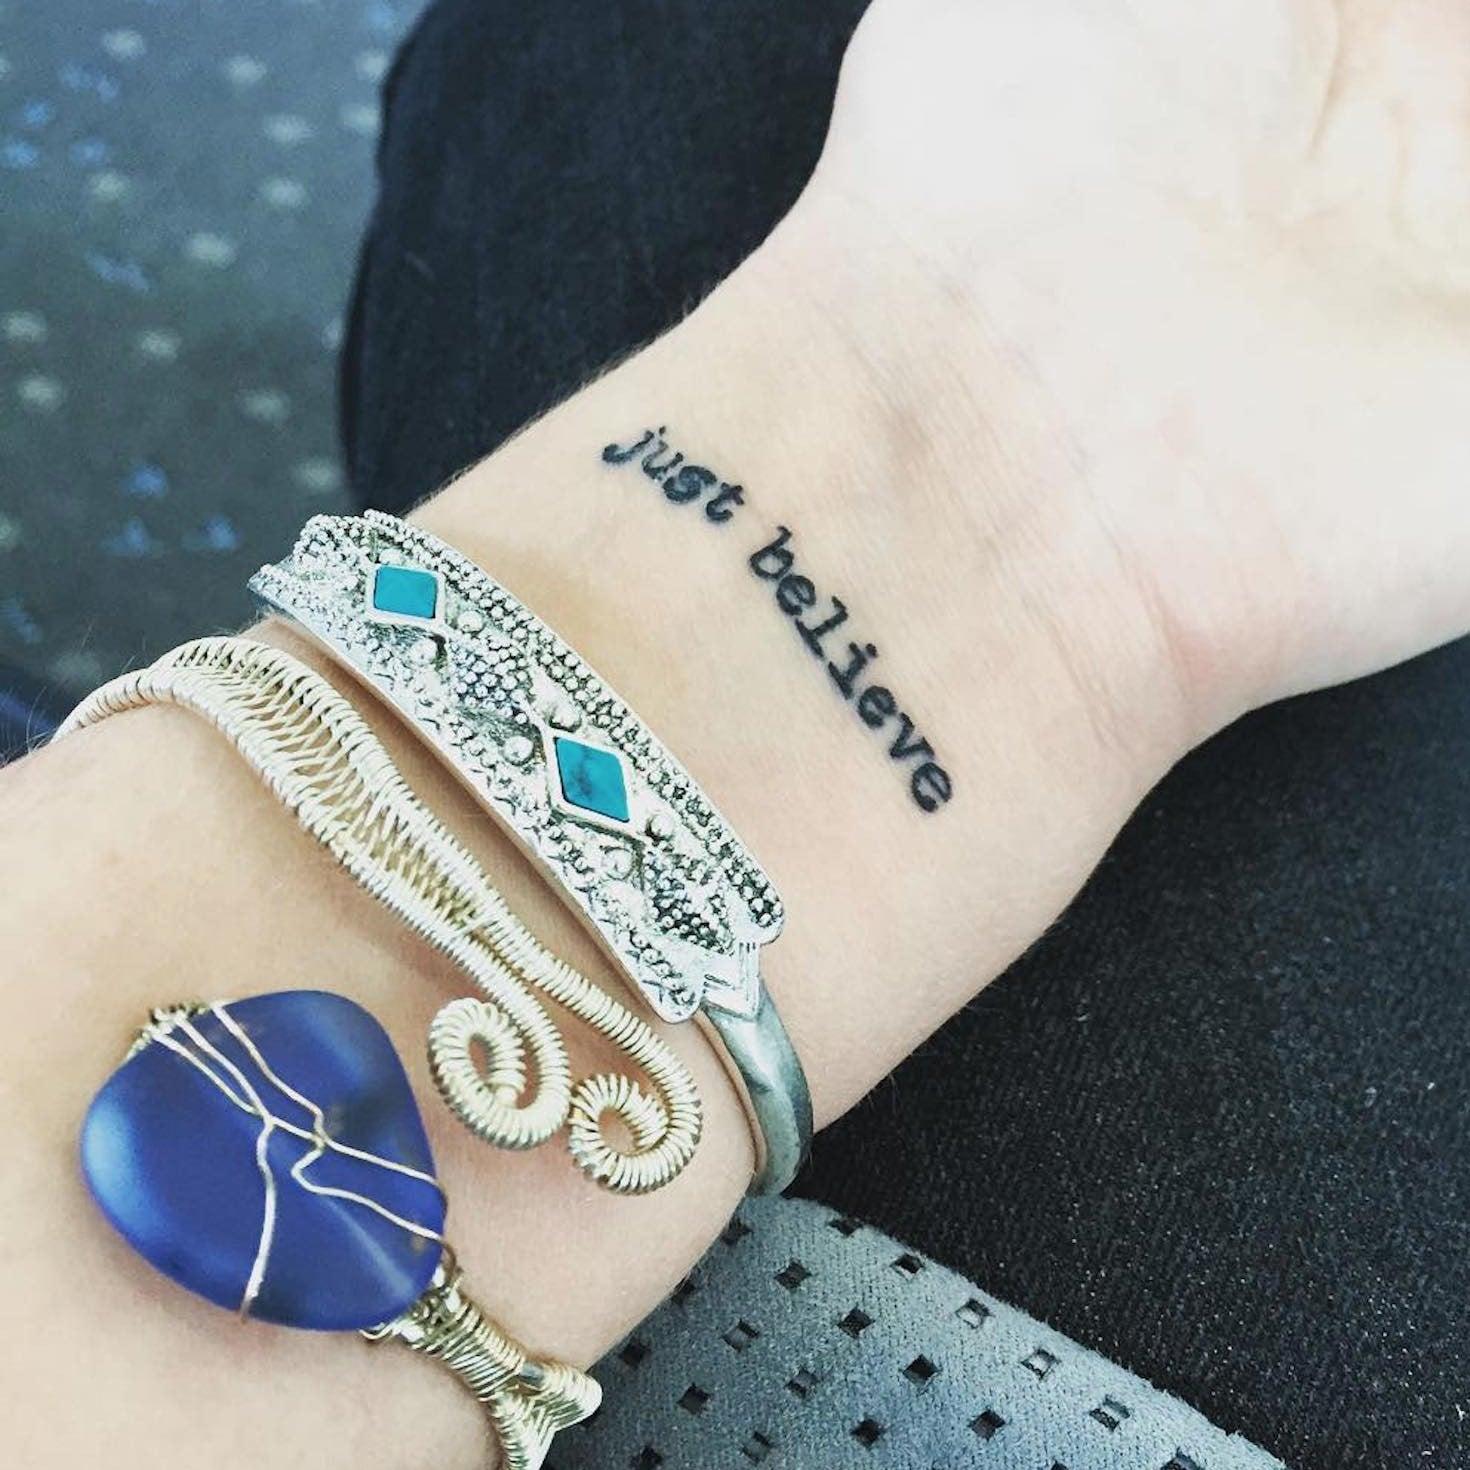 ad2efad2c5905 Small Inspirational Tattoos. 34 Tiny Inspirational Tattoos That Will  Motivate You to Live BIG